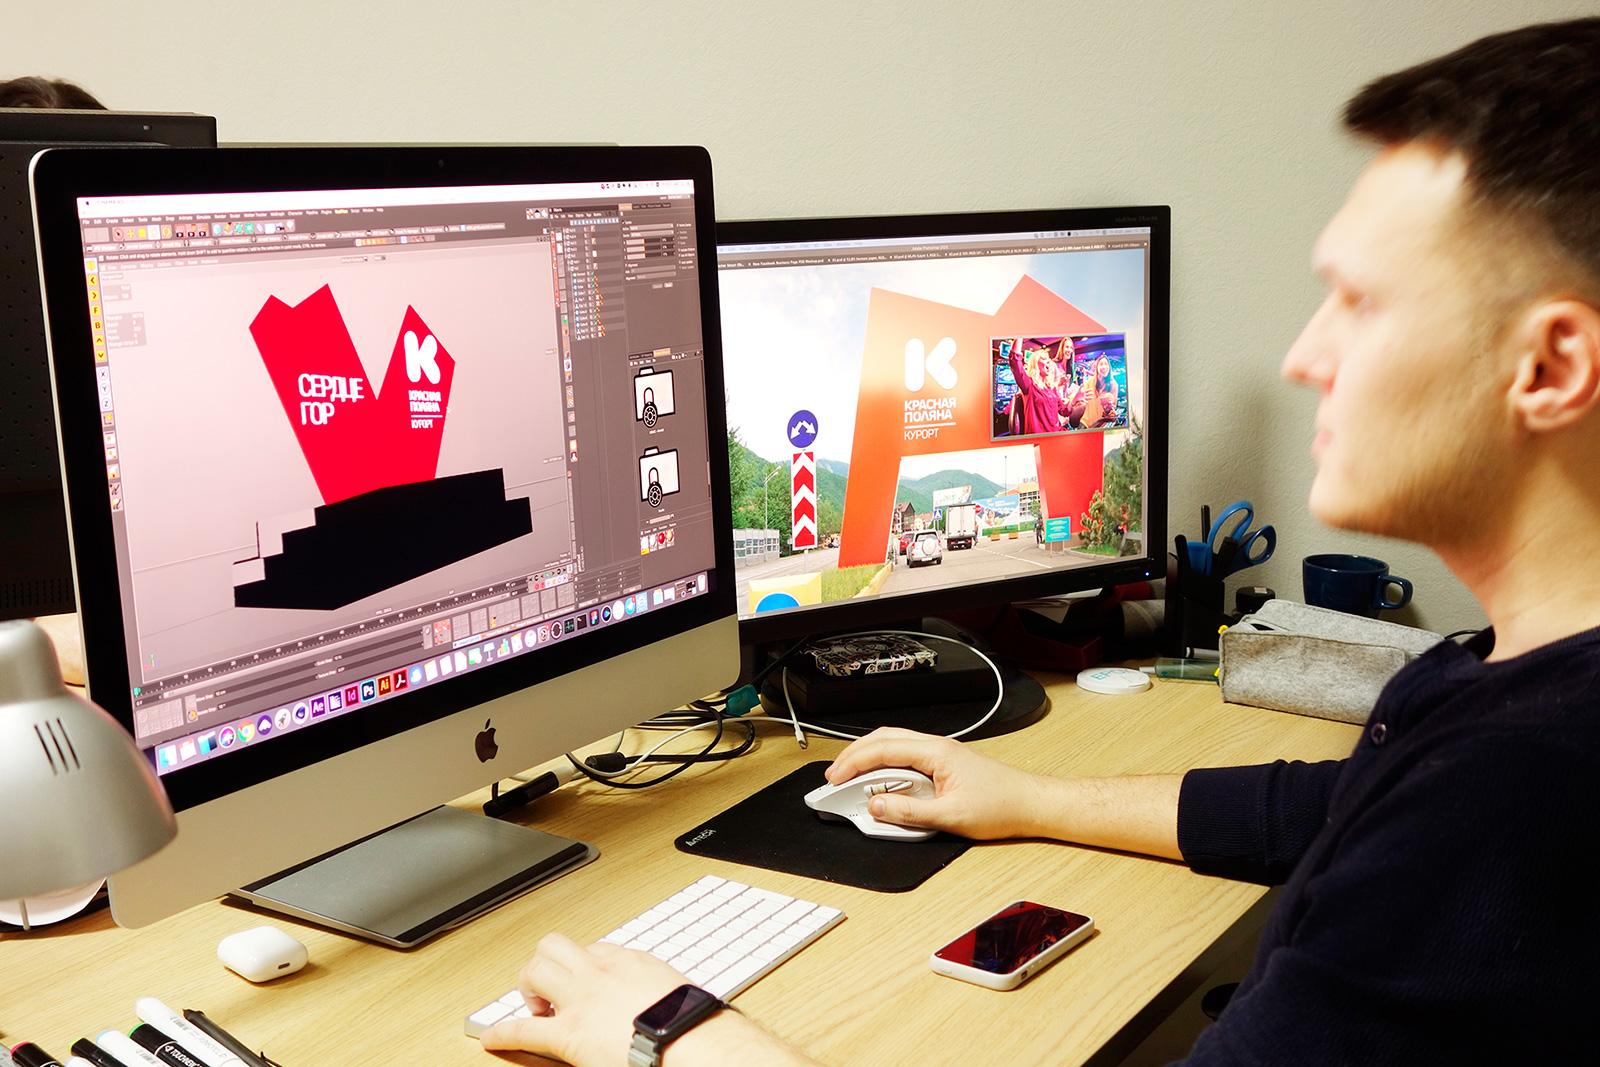 Ильдар Исанбаeв, Ildar Isanbaev, sketch, дизайн, Asgard design agency, Красная Поляна, 3D сердце гор